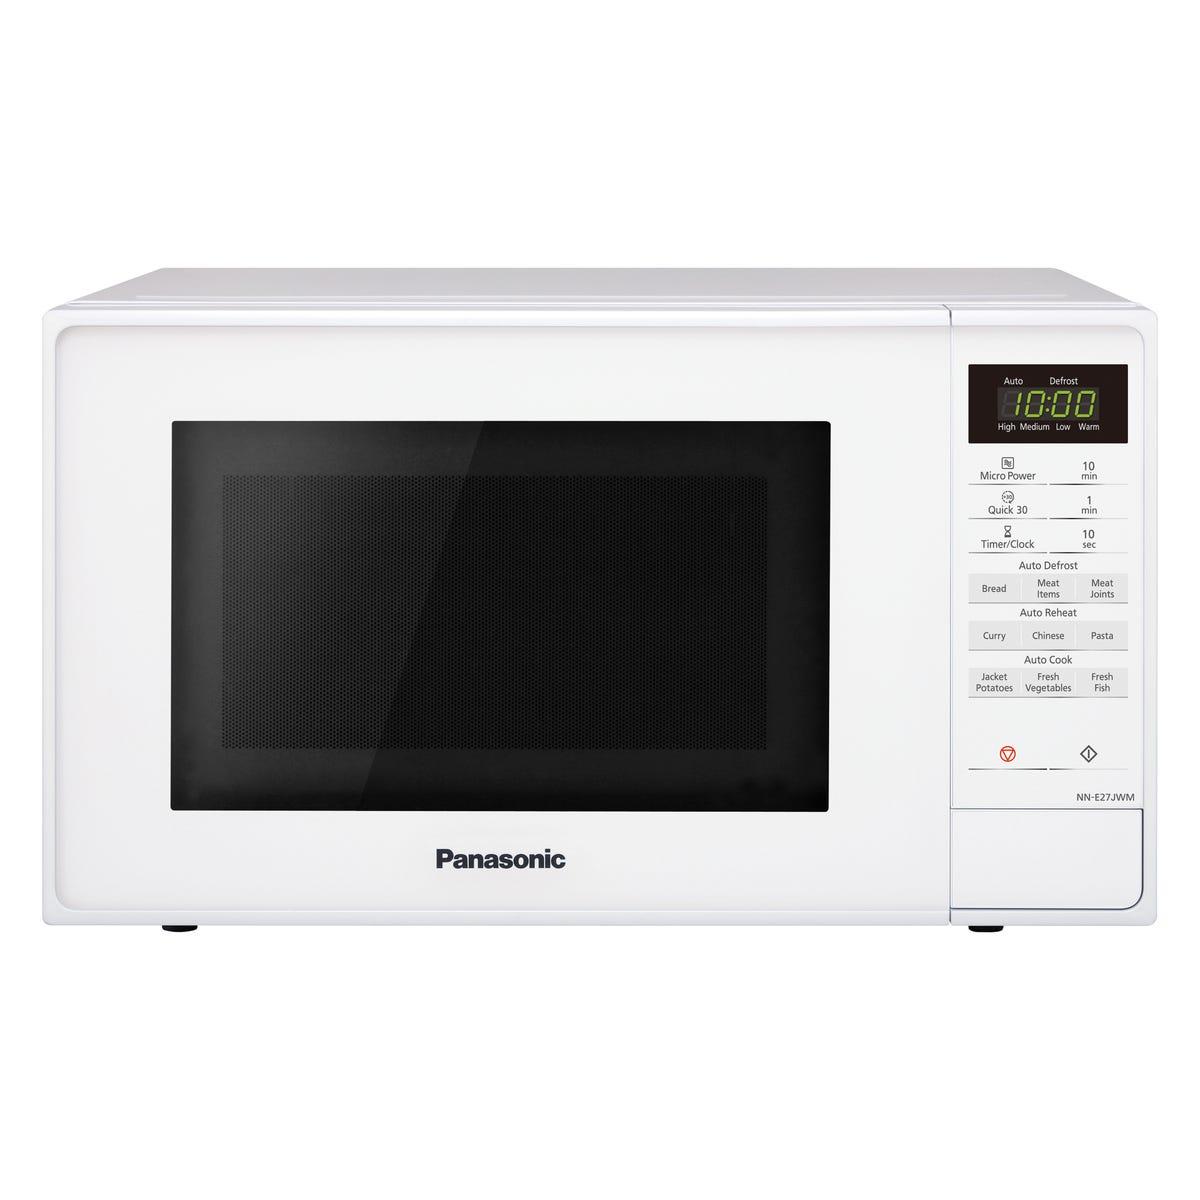 Panasonic NN-E27JWMBPQ 20L 800W Touch Control Solo Microwave - White